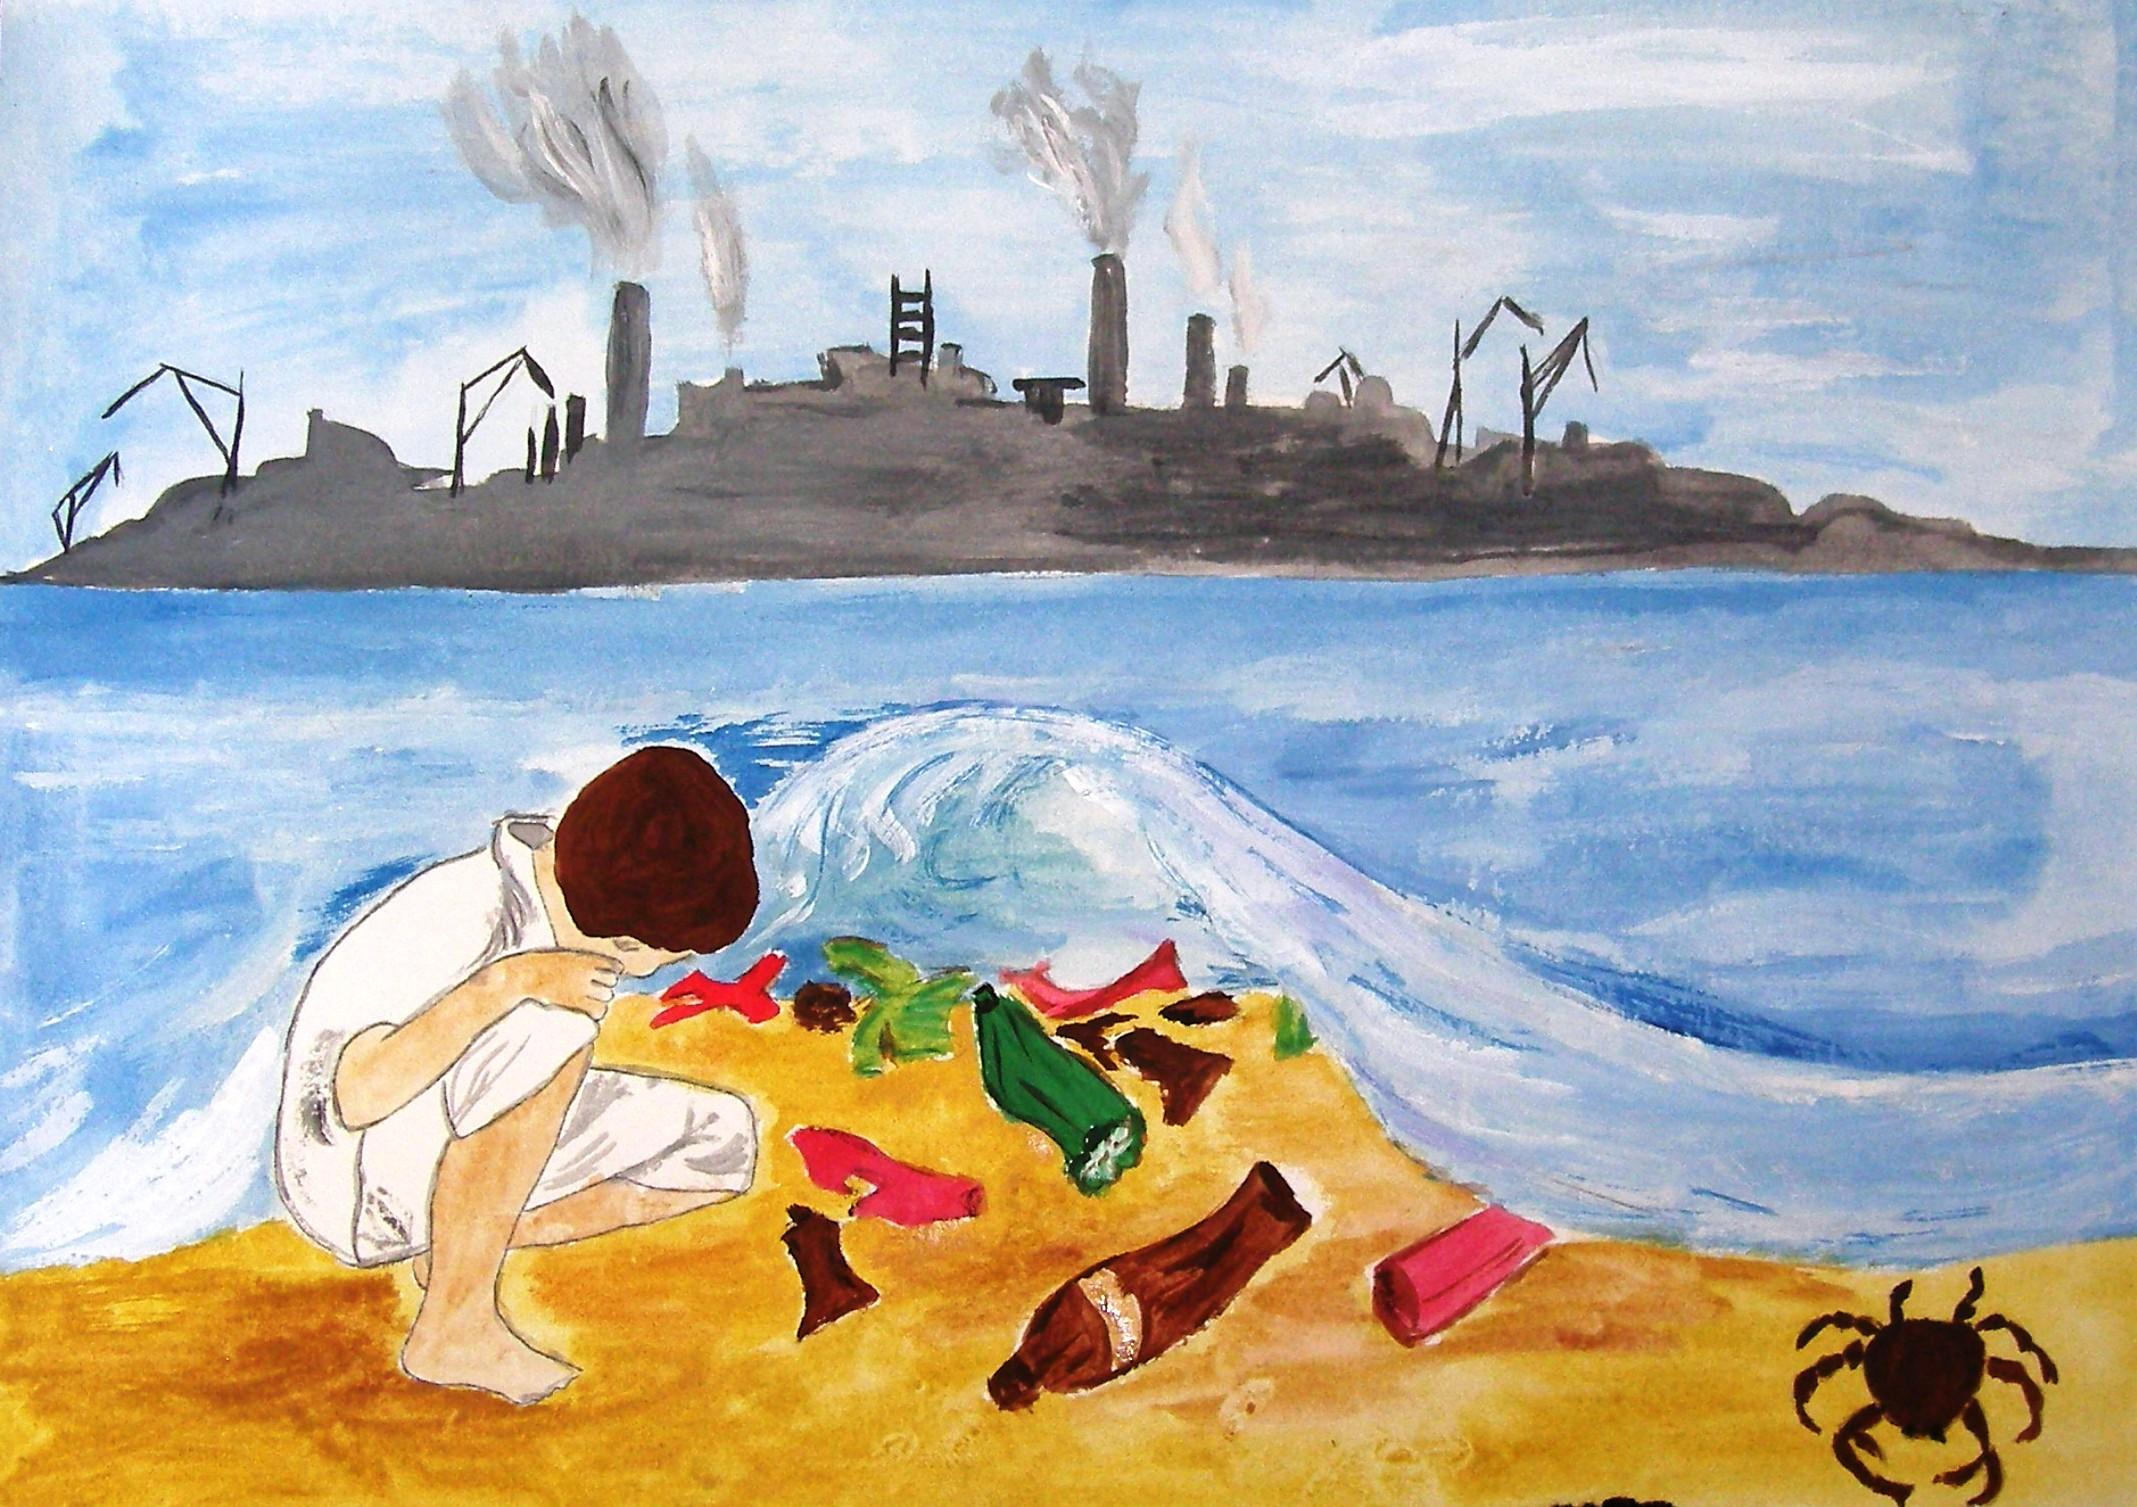 Рисунок на тему чем люди загрязняют природу 3